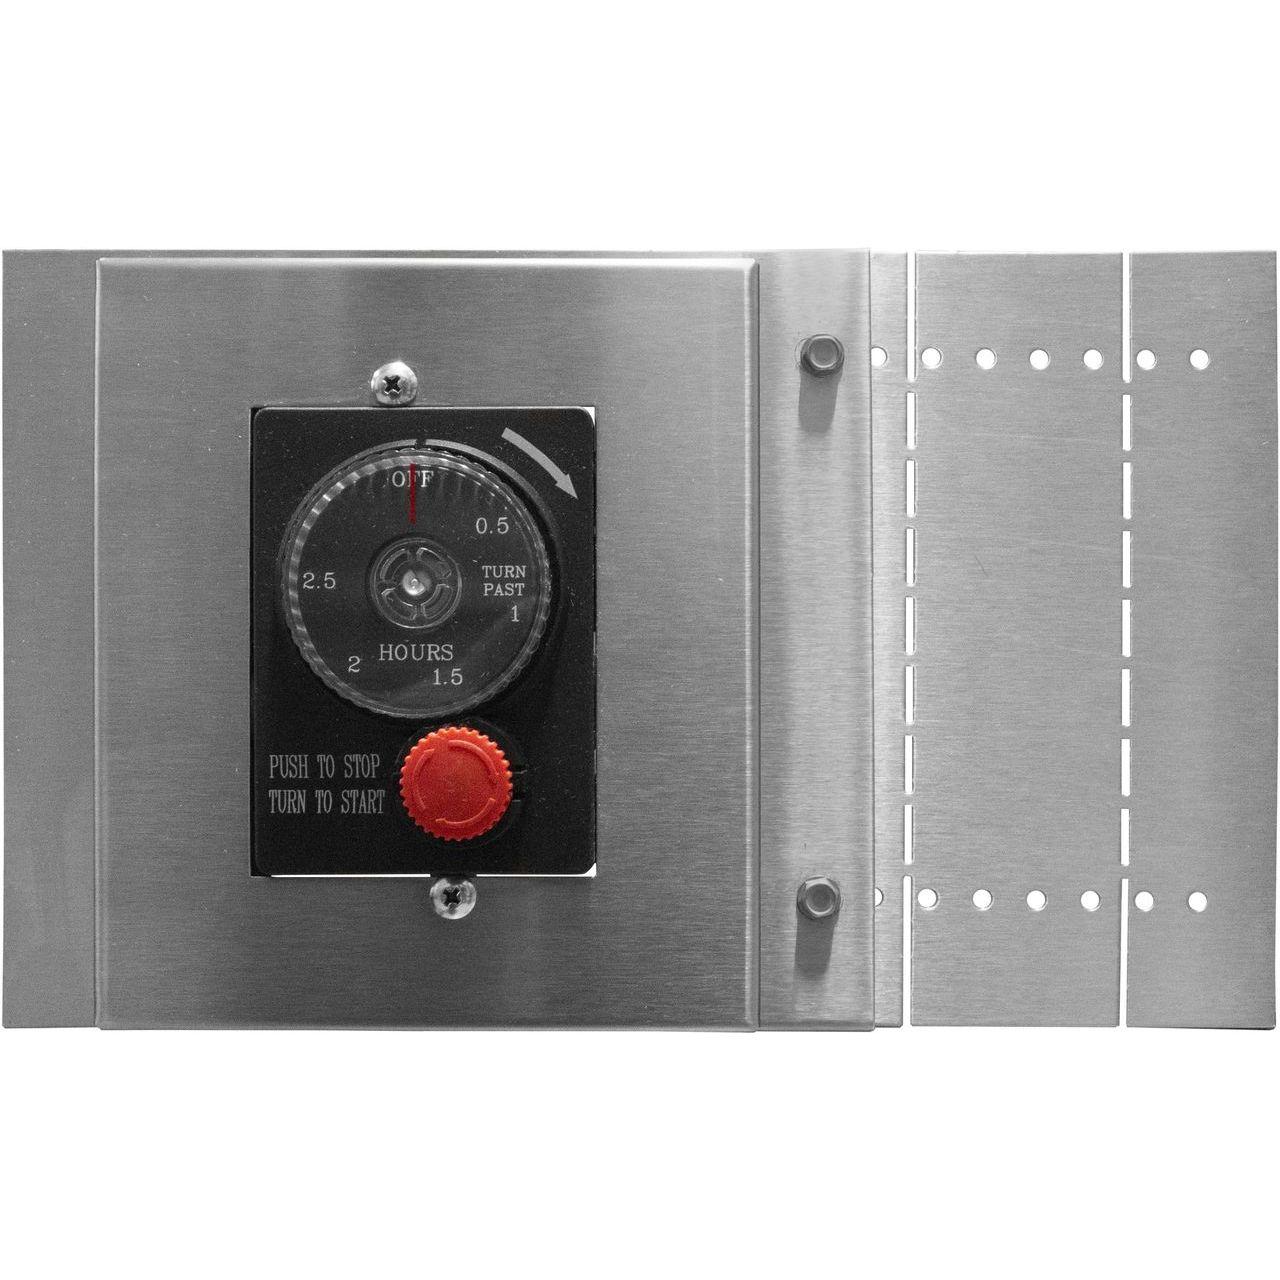 Summerset E-STOP Gas Timer Control Panel Kit